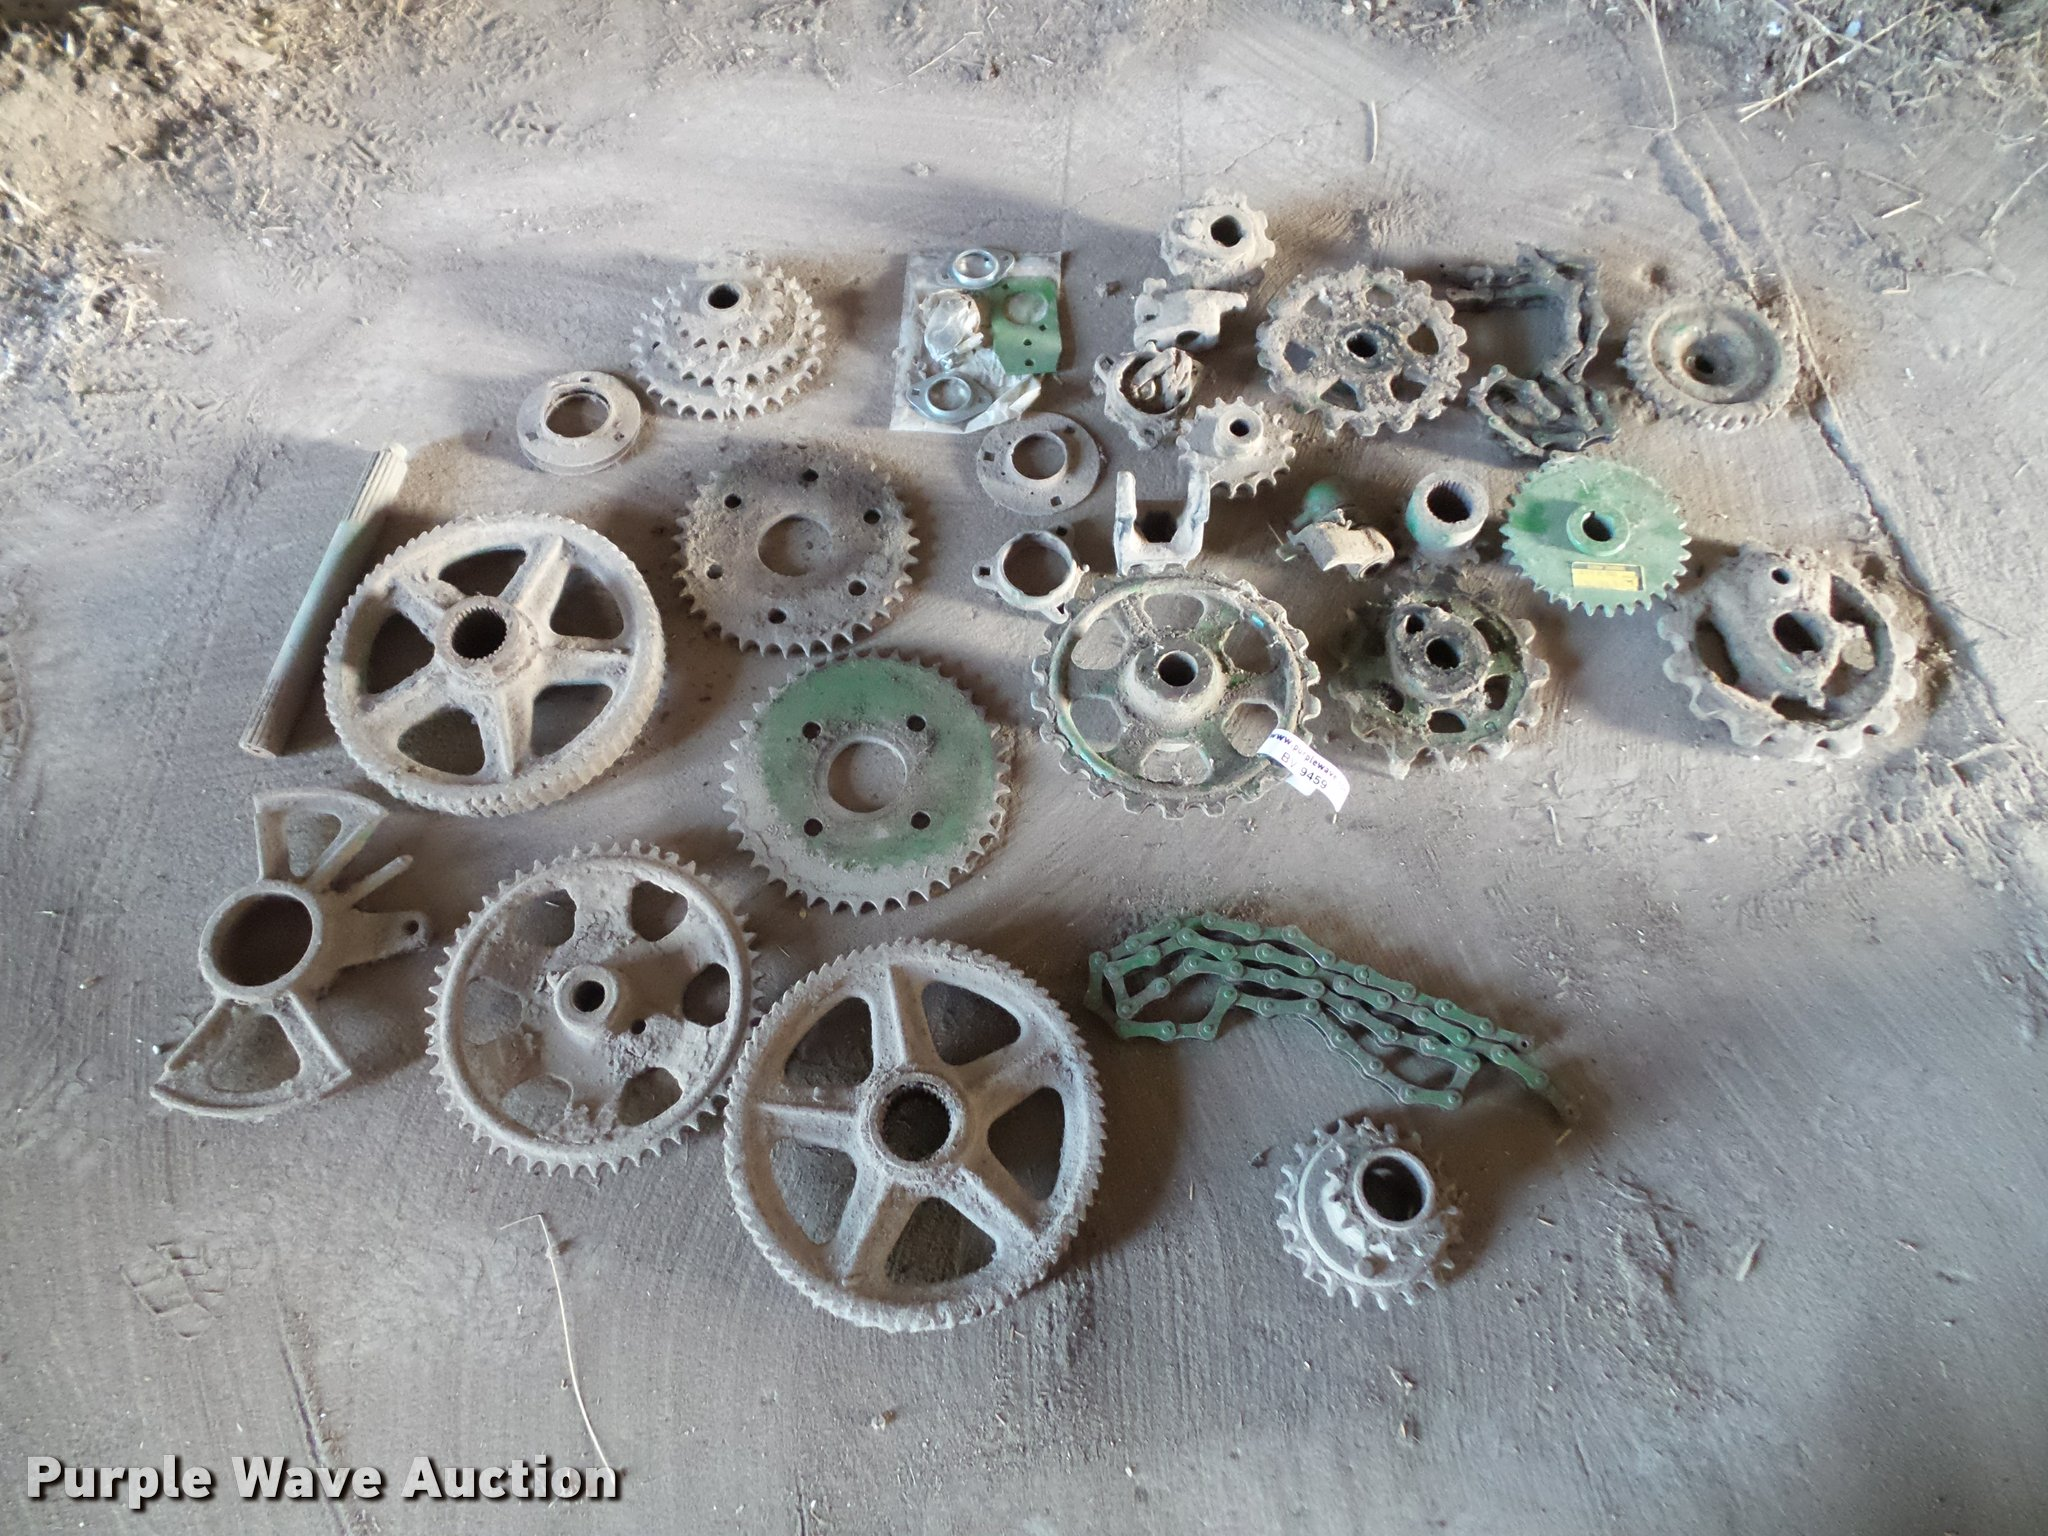 Approximately 28 John Deere chuck wagon parts | Item BV9459